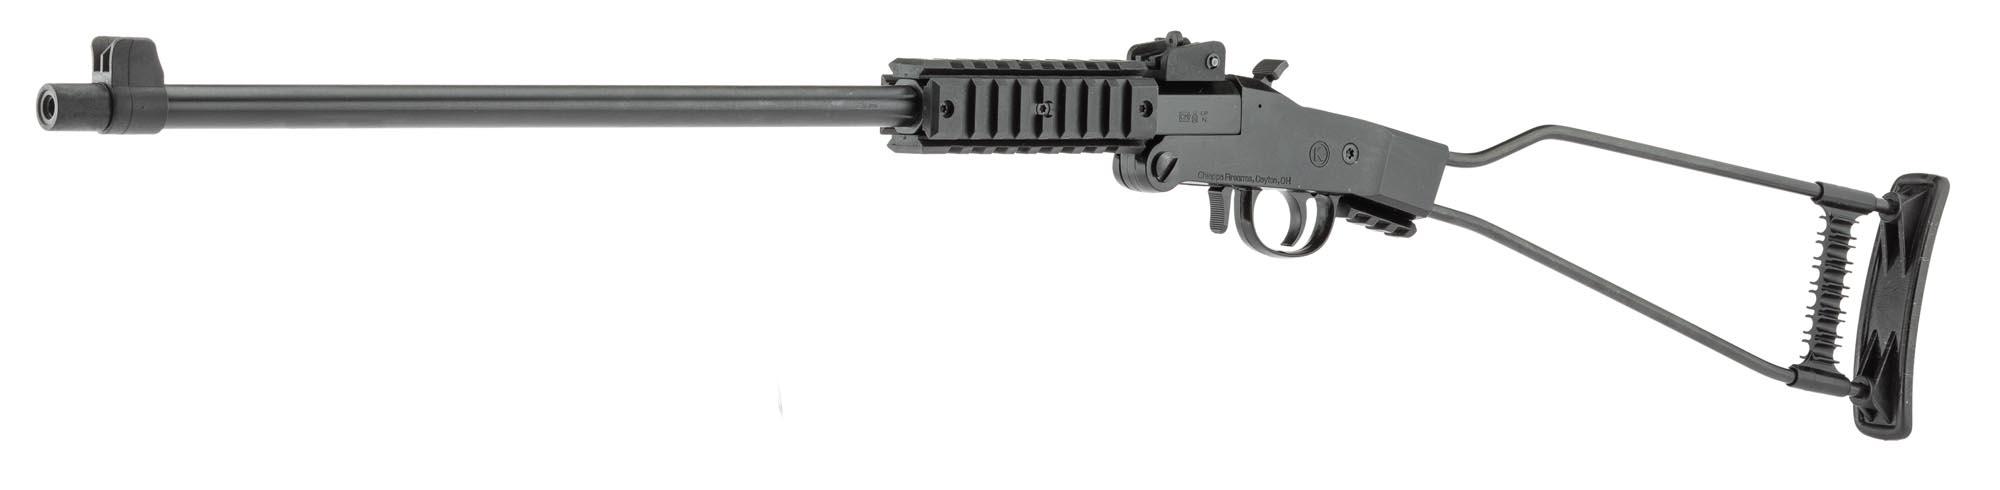 CR382-1